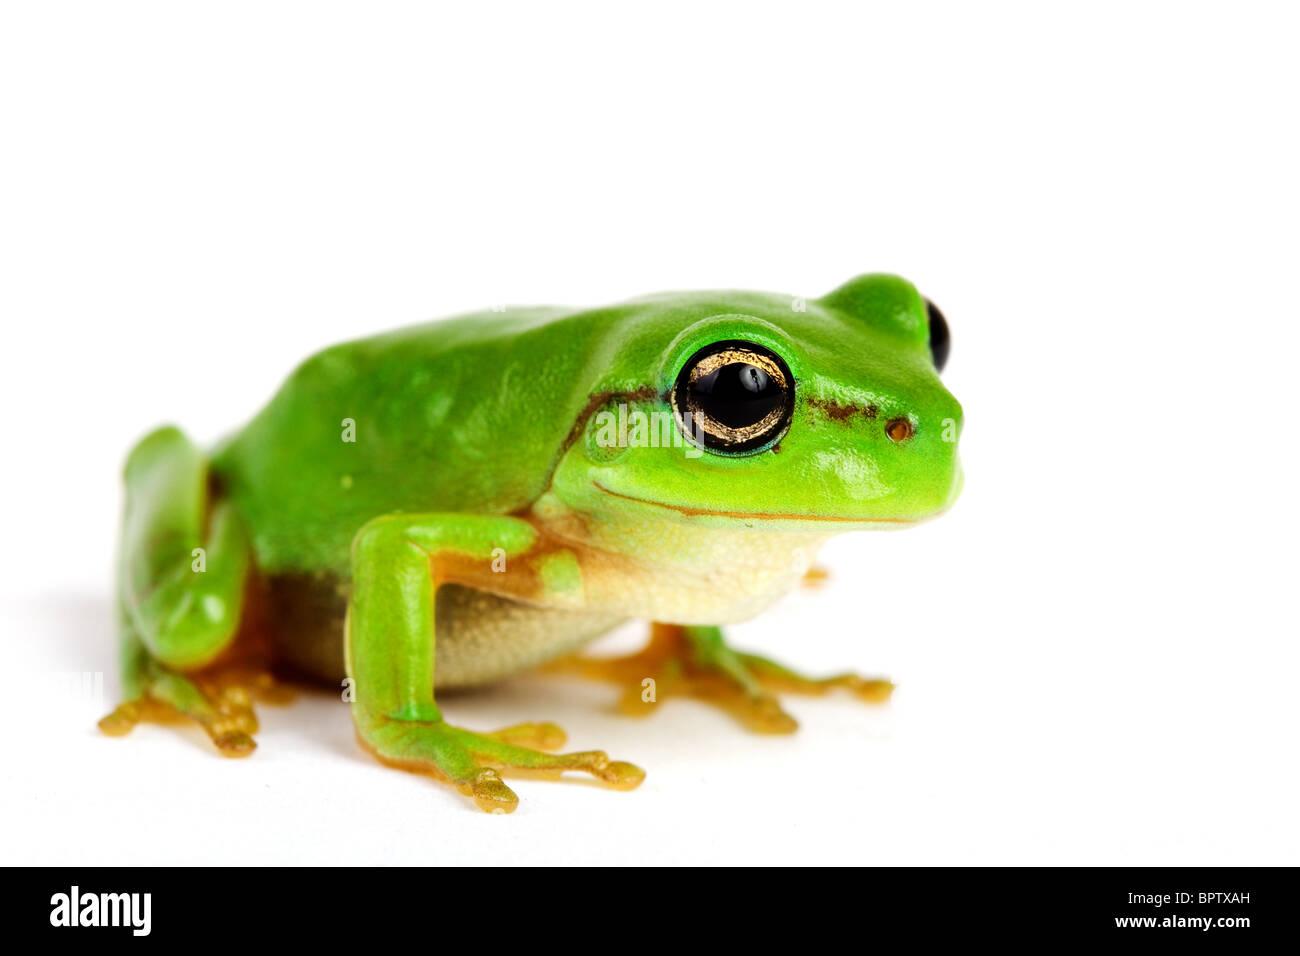 Little tree-frog on white background - close-up - Stock Image